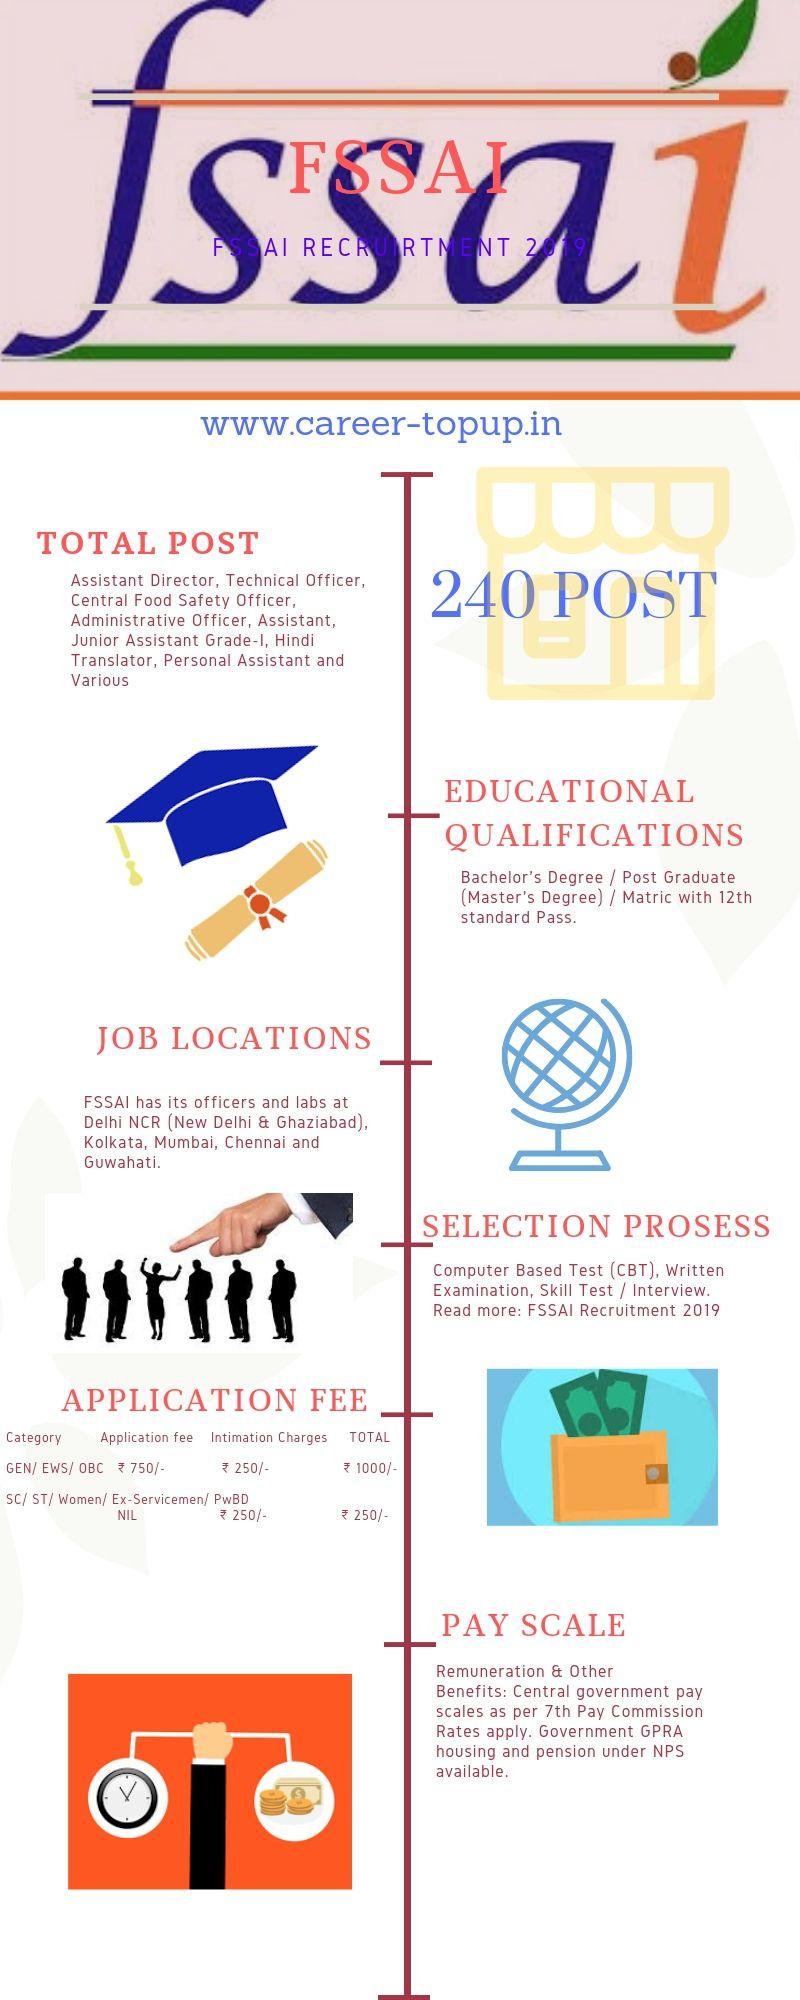 FSSAI Recruitments 2019 Job, Education jobs, Apply online